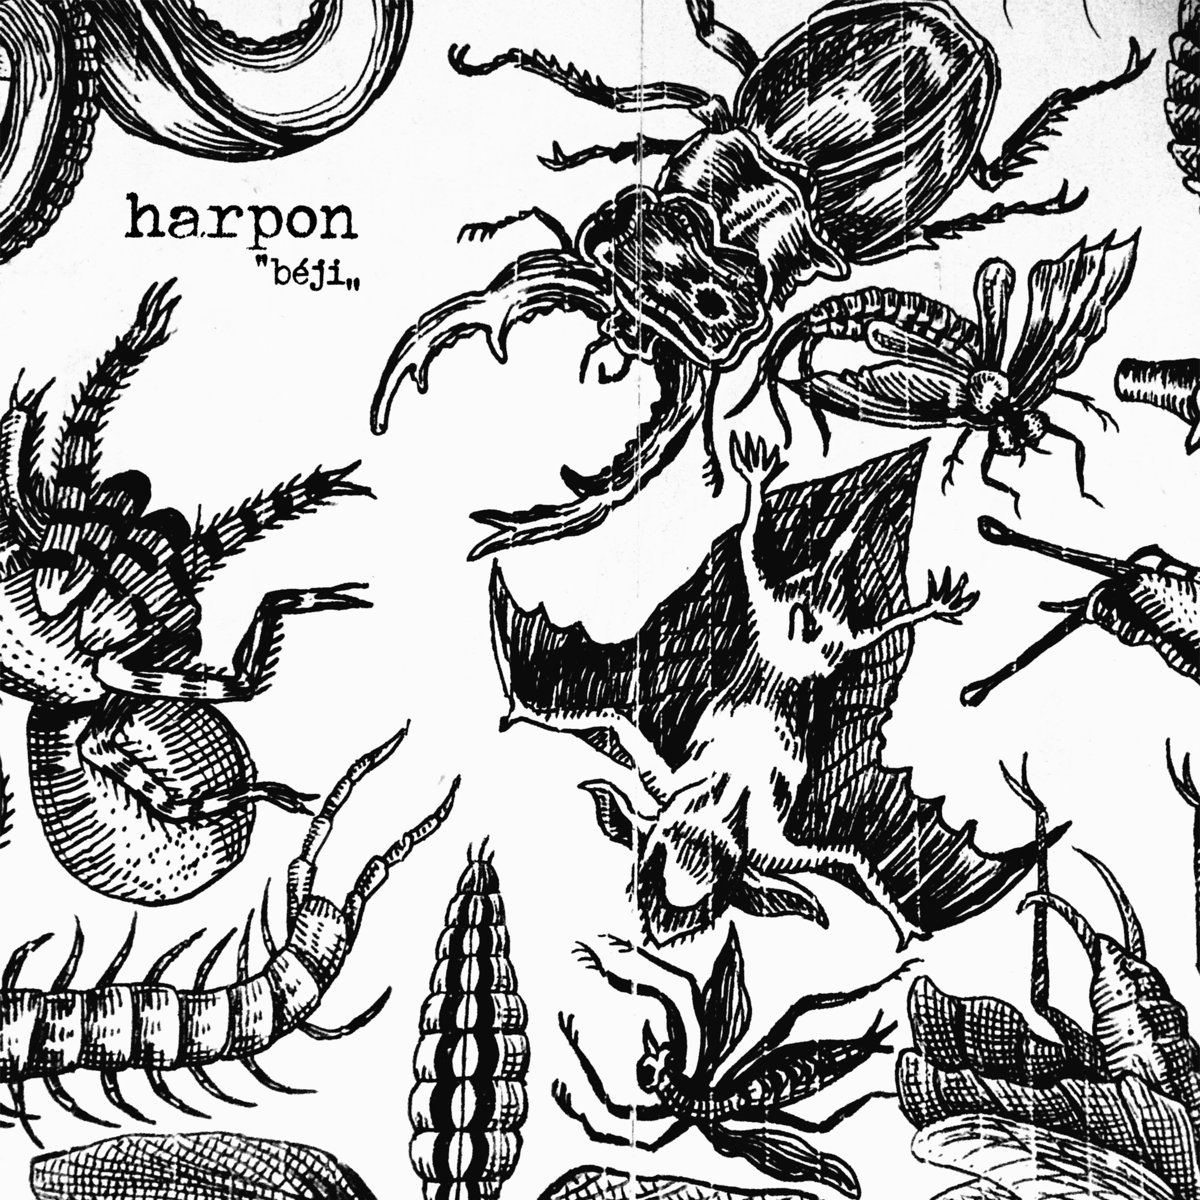 HARPON Béji - Vinyl LP (black)